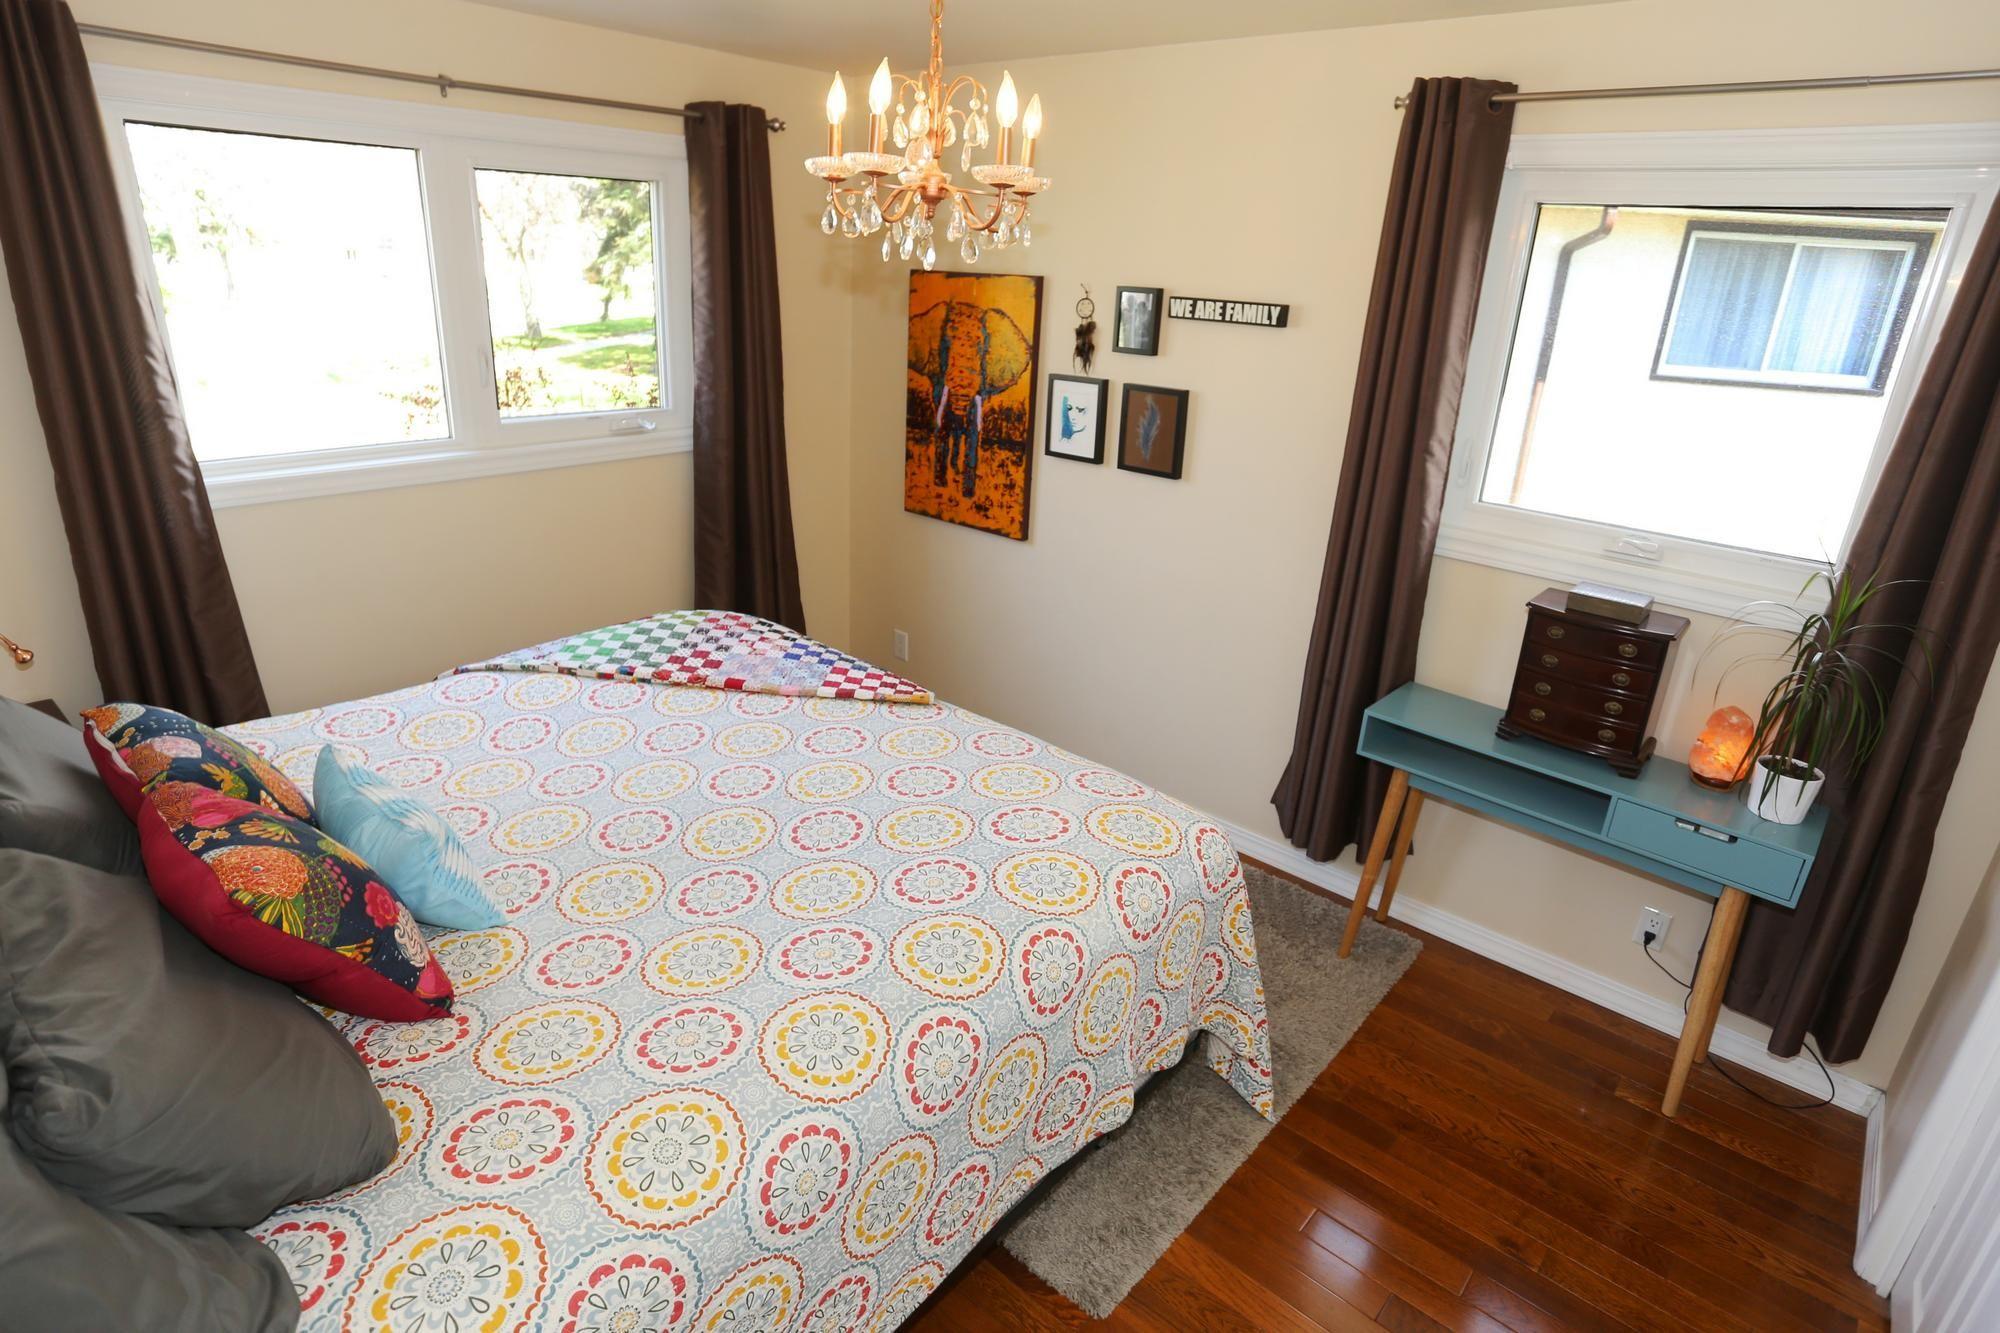 Photo 16: Photos: 1322 Valour Road in Winnipeg: Sargent Park Single Family Detached for sale (5C)  : MLS®# 1811835